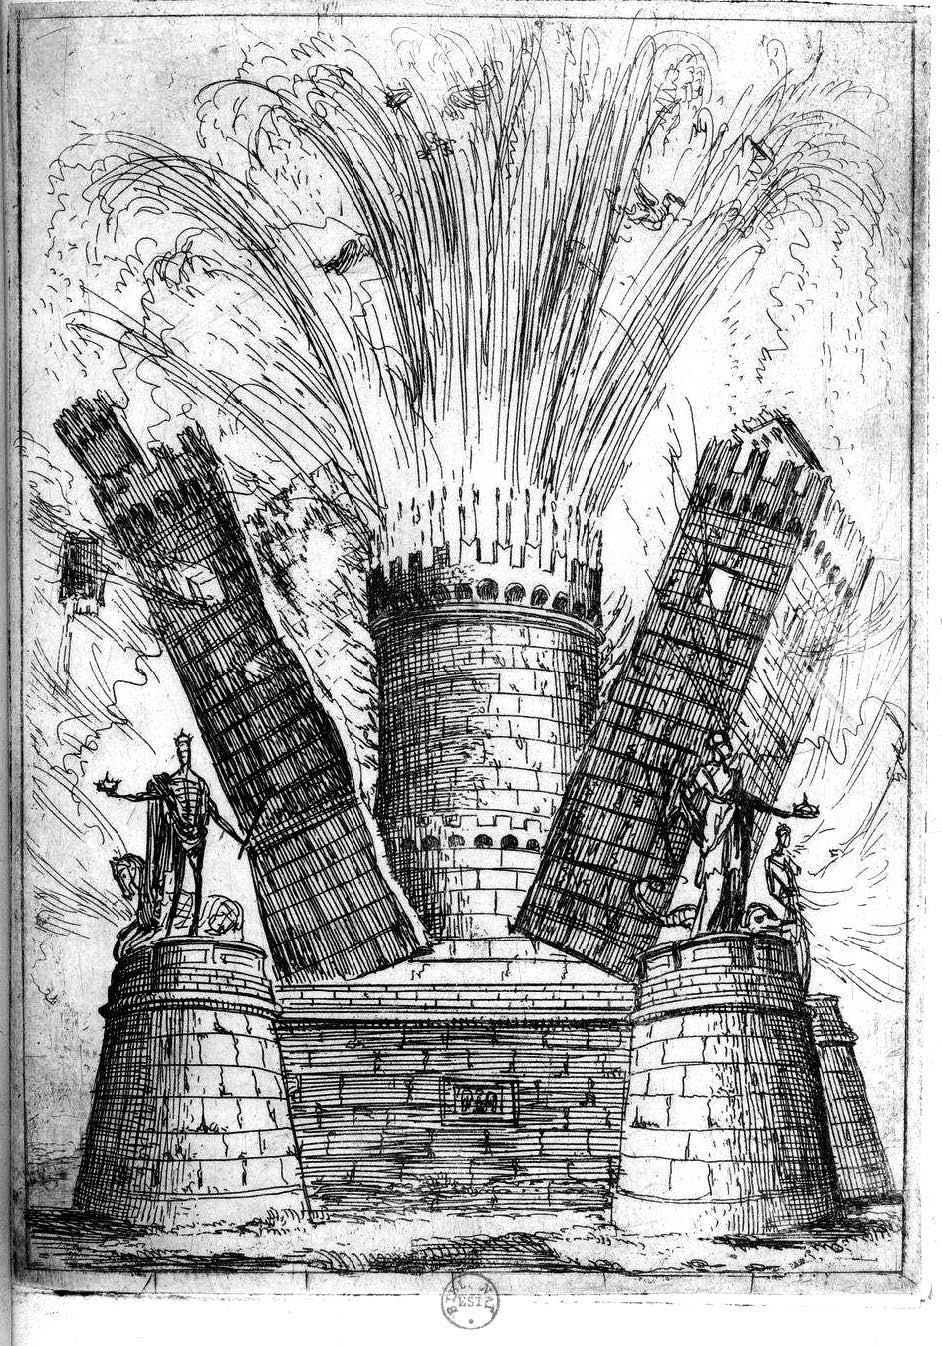 The image above is from Claude Lorrain's series featured in Relatione delle feste fatte dell' Excellentiss. Sig. Marchese di Castello Rodrigo (1637)